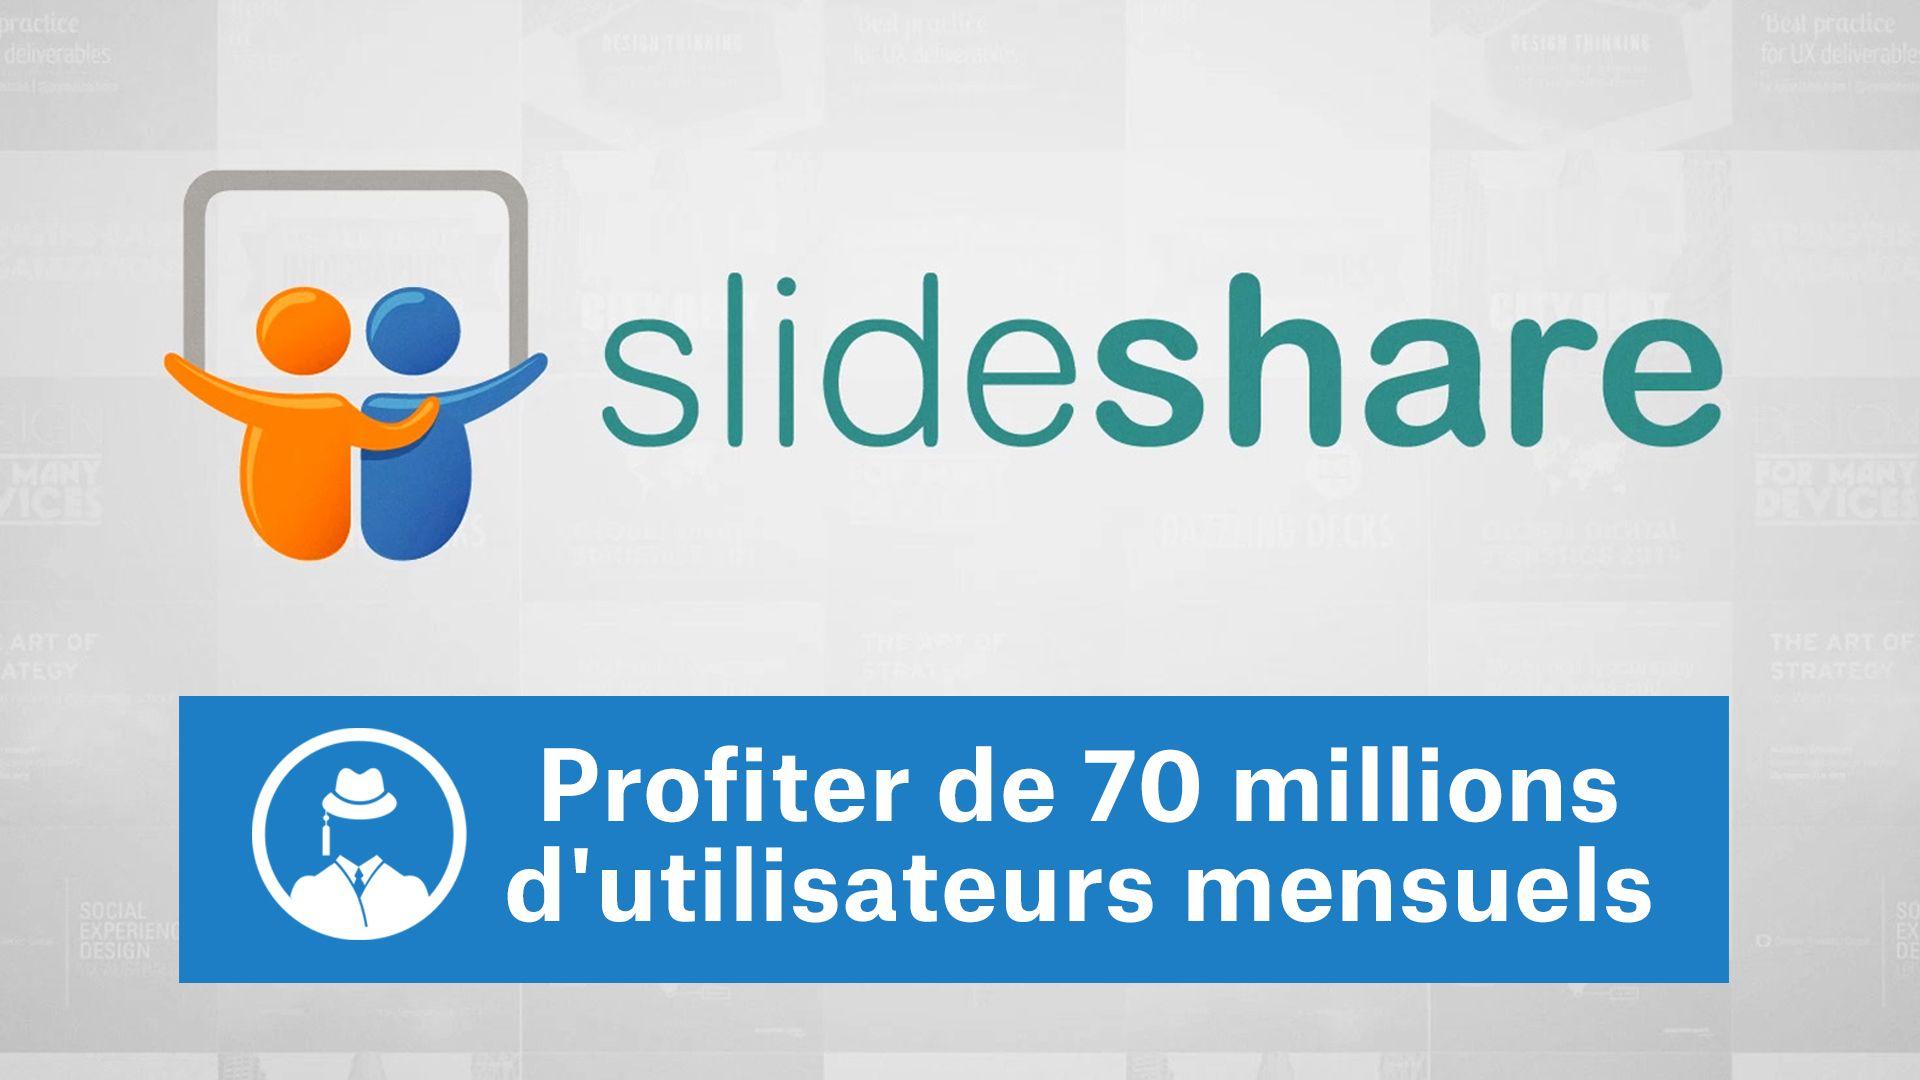 Profiter des 70 millions d'utilisateurs mensuels de SlideShare #GrowthHacking #WebMarketing #FormationGrowthHacking #CentreDeFormationFrance #TunnelAARRR #AARRR #SocialMedia #CommunityManagement #SEO